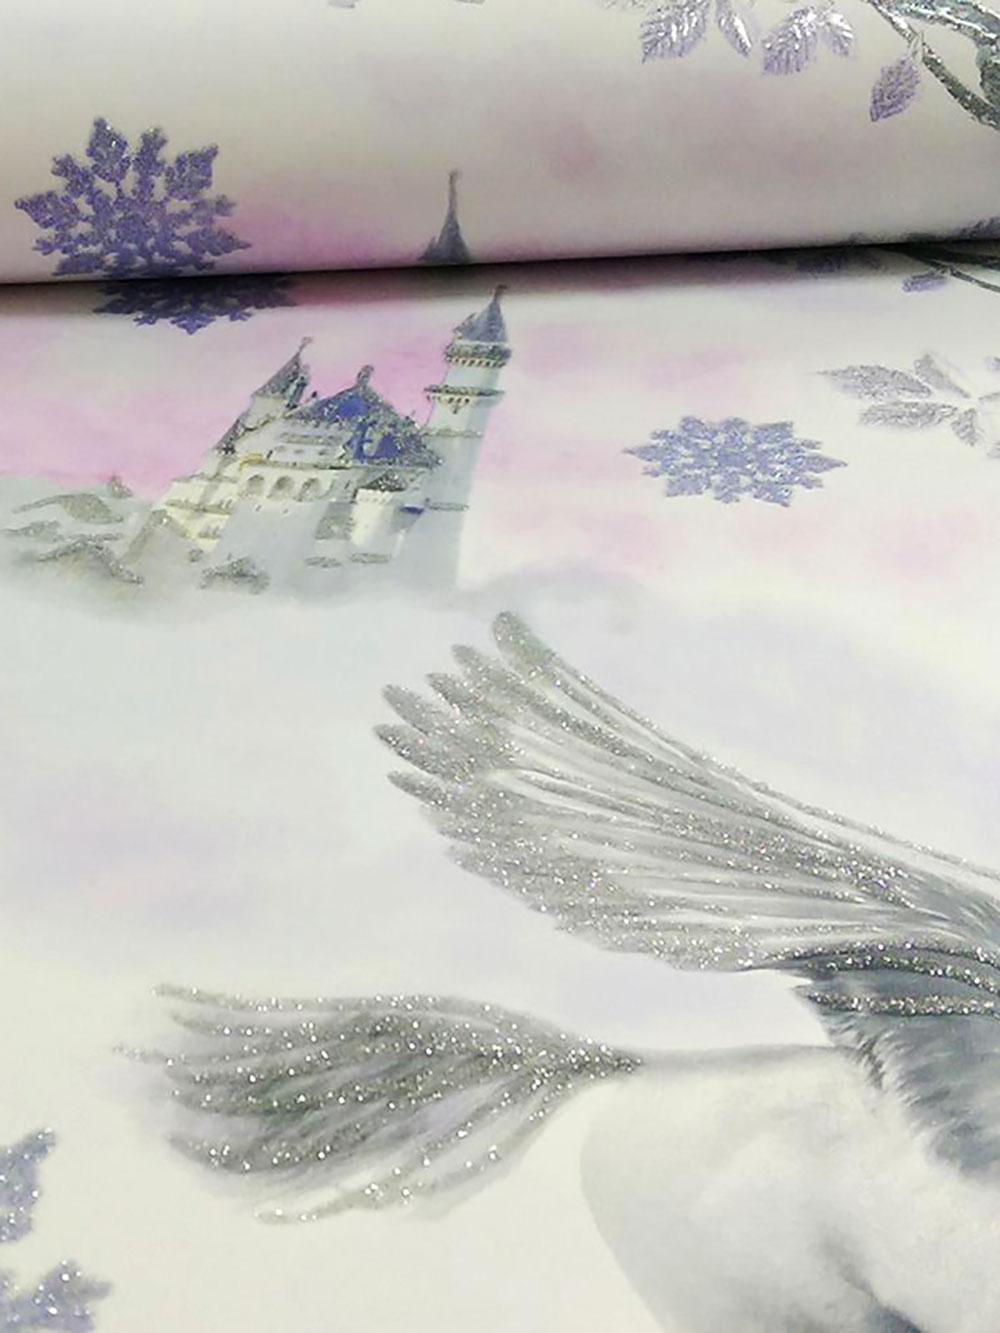 tapete einhorn pegasus glitter effekt schloss m dchen wandtapete arthouse edel ebay. Black Bedroom Furniture Sets. Home Design Ideas